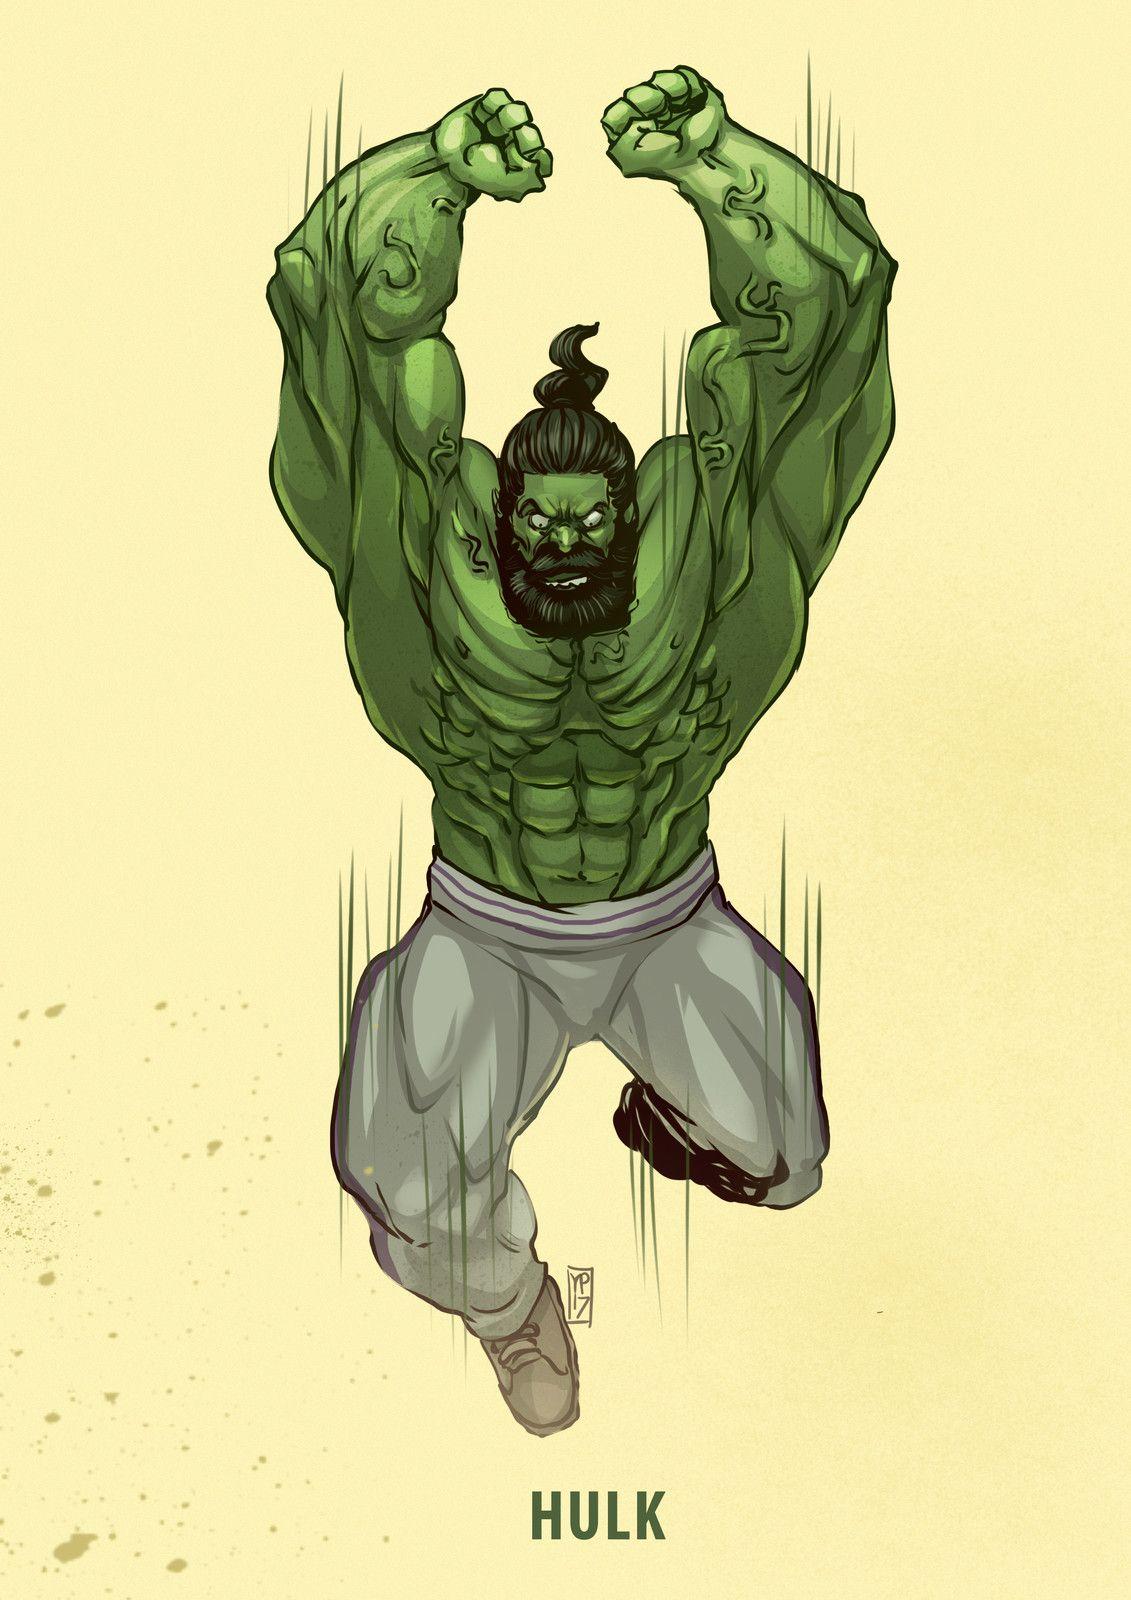 Hulk fan art gym trainer hulk by desar yuartha the